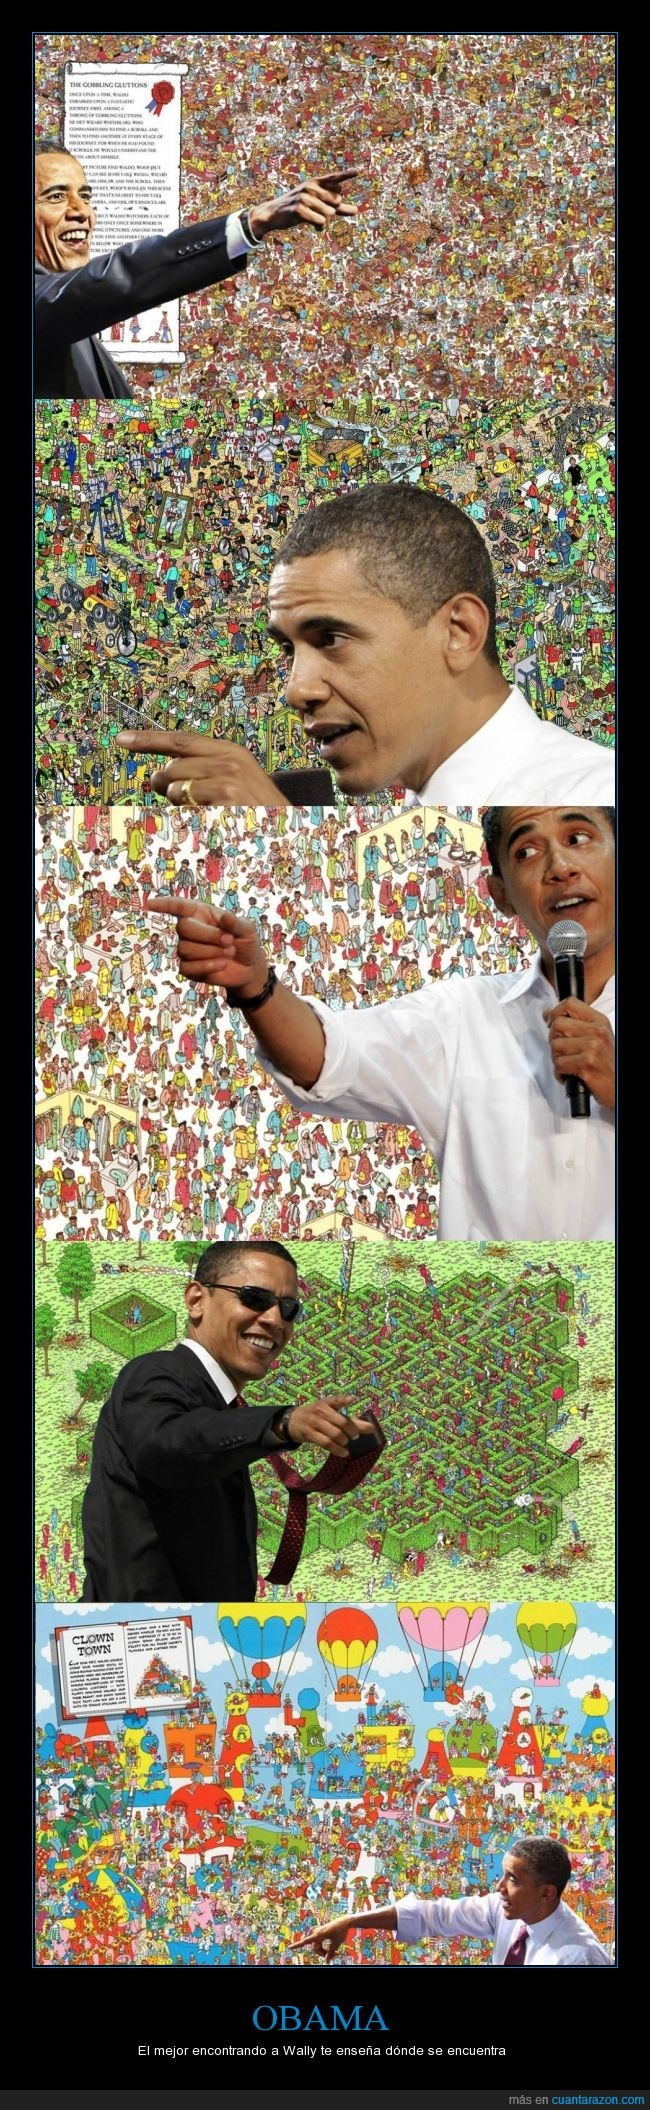 apuntar,dedo,dónde está wally,Obama,señalar,Wally